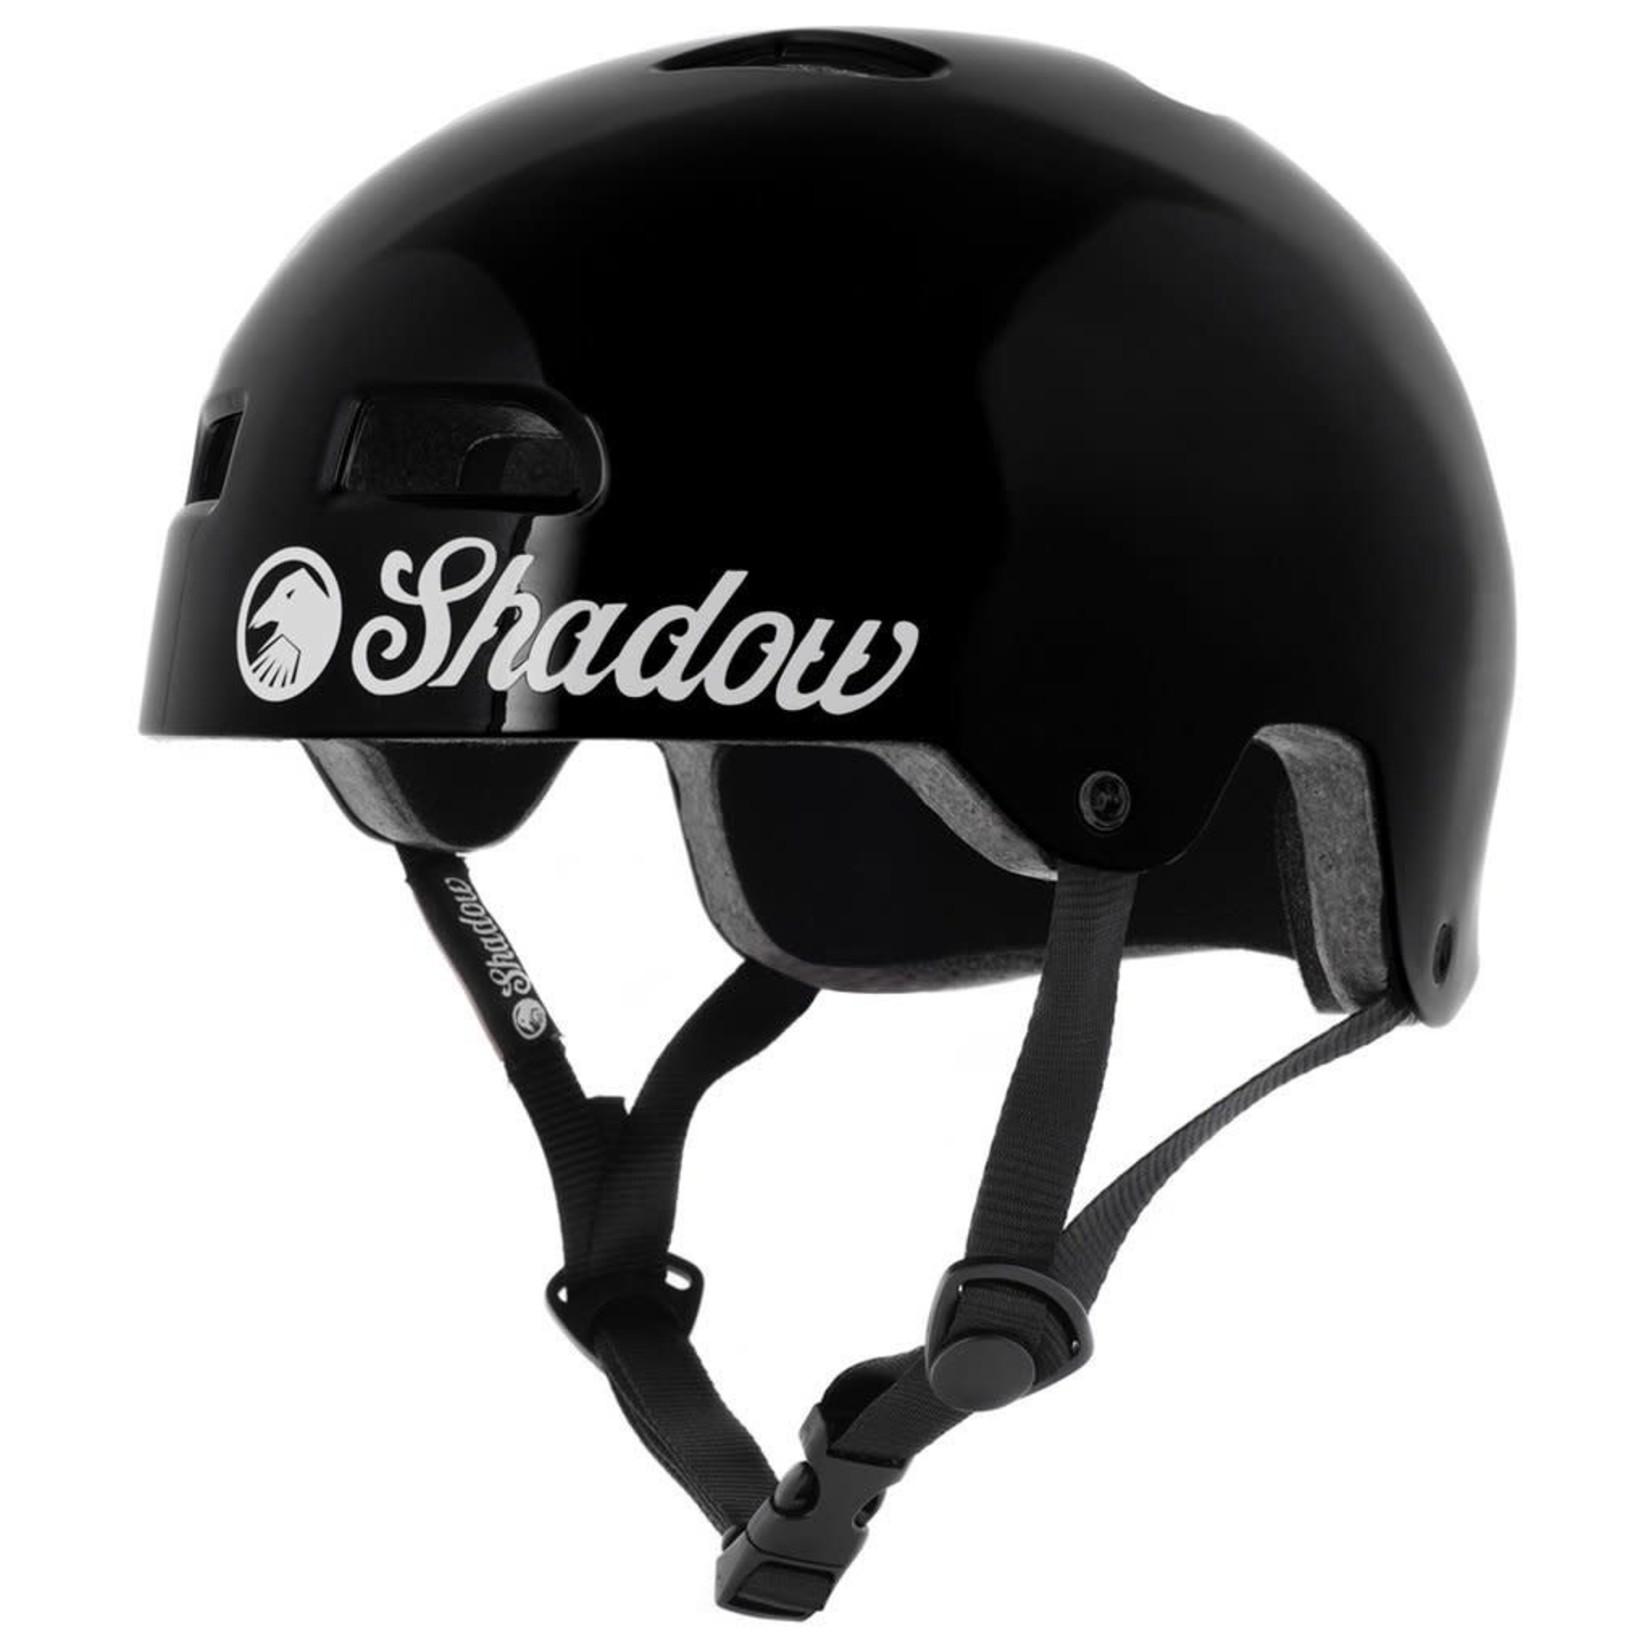 The Shadow Conspiracy Classic Helmet LG-XL Gloss Black